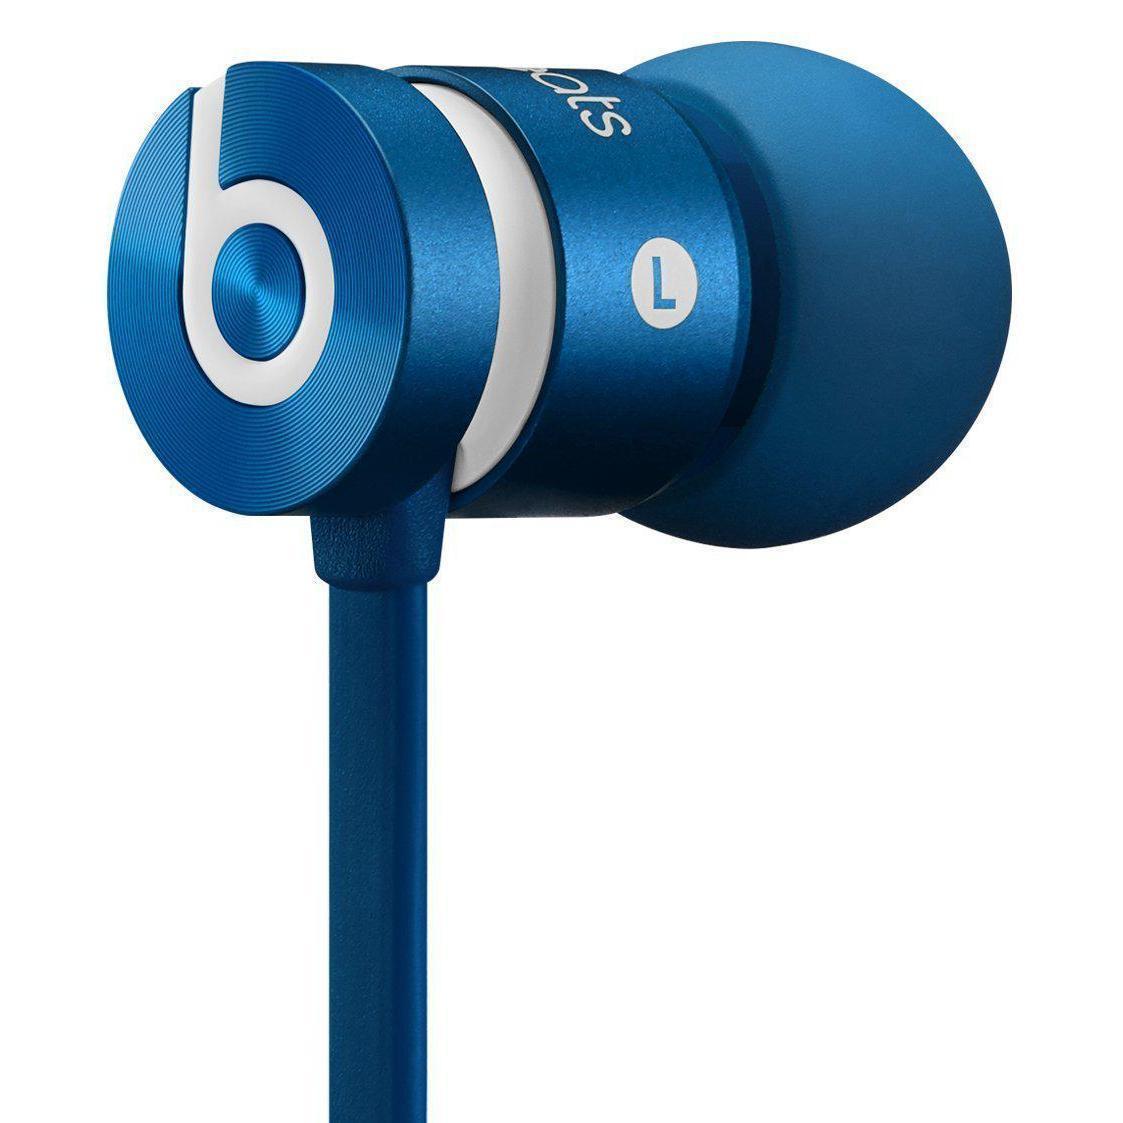 Écouteurs avec micro Beats Urbeats - Bleu